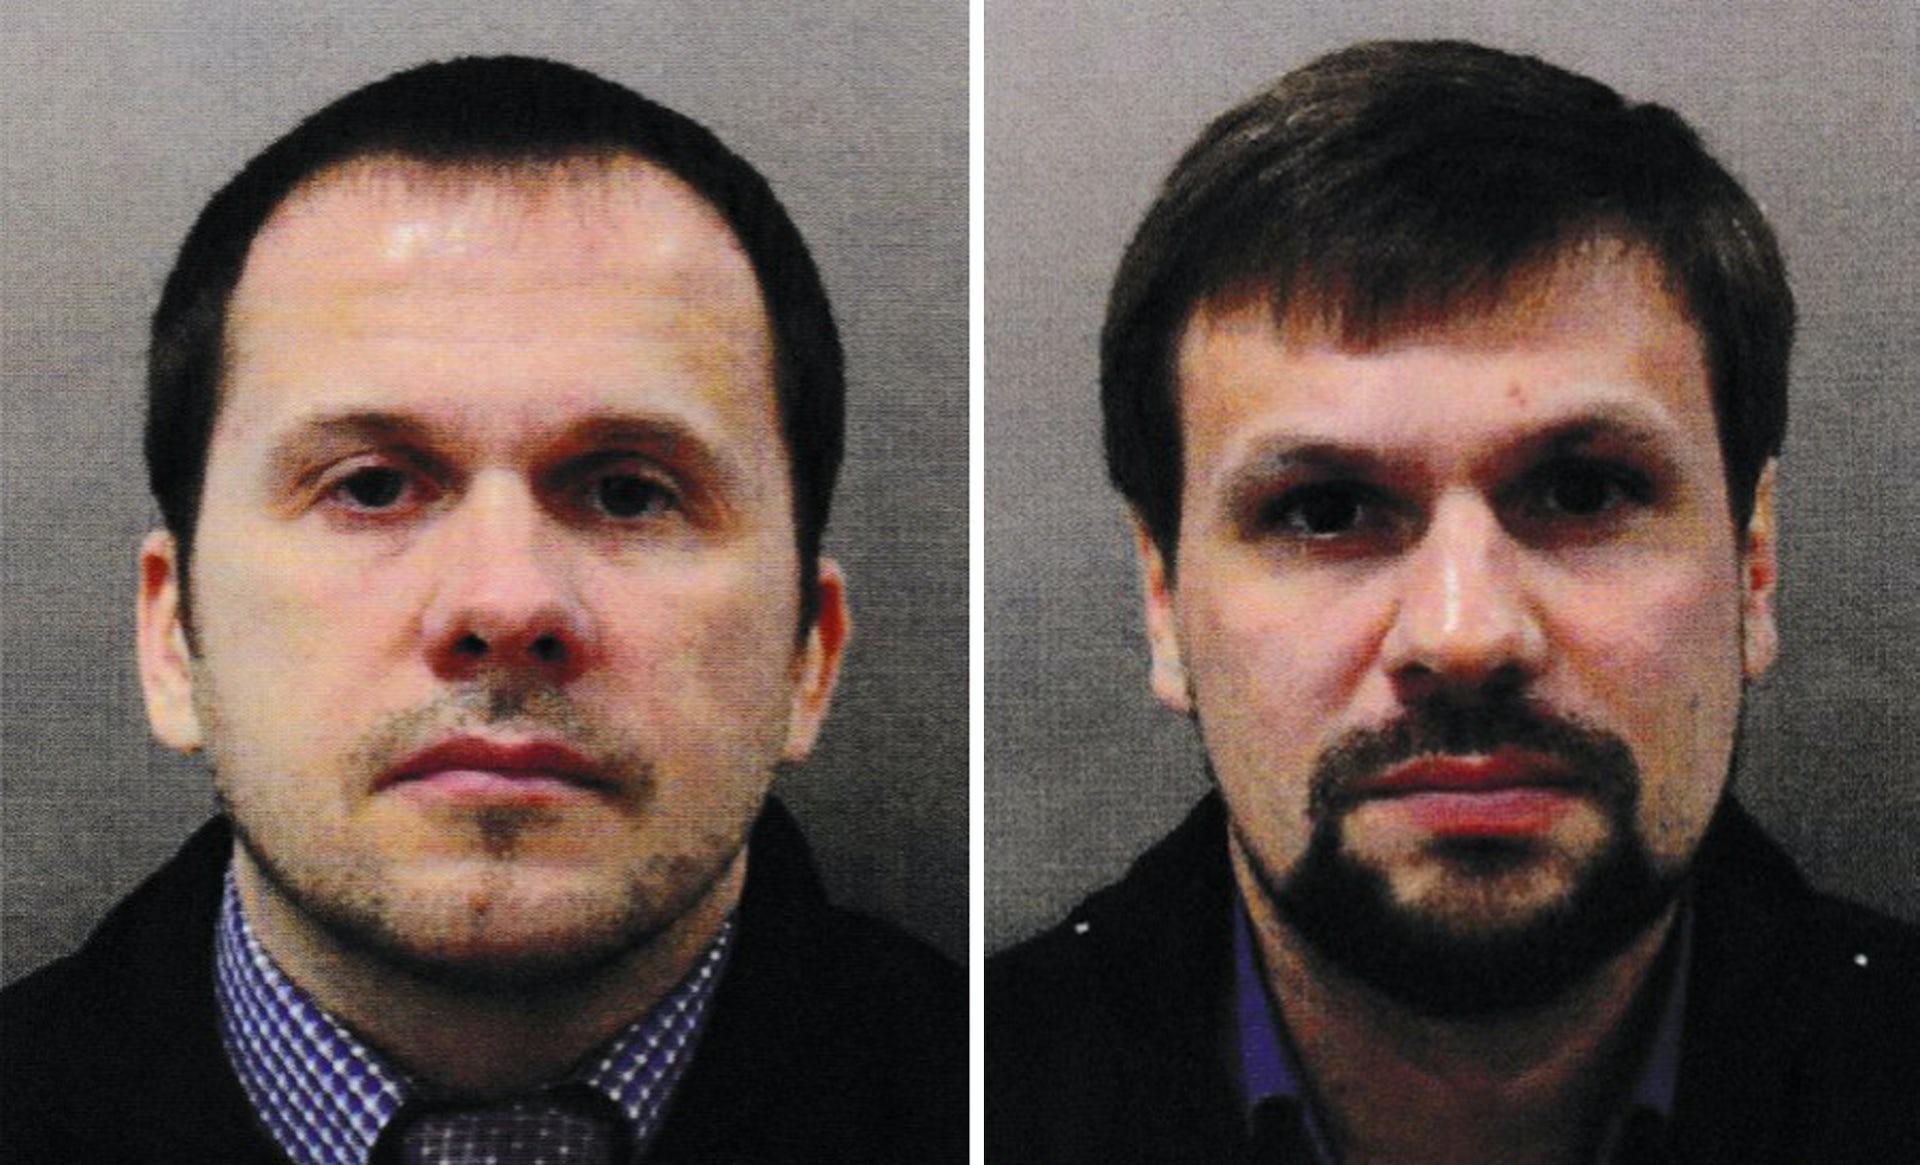 Petrov, Boshirov, Colonel Chepiga. And who do you actually believe 29